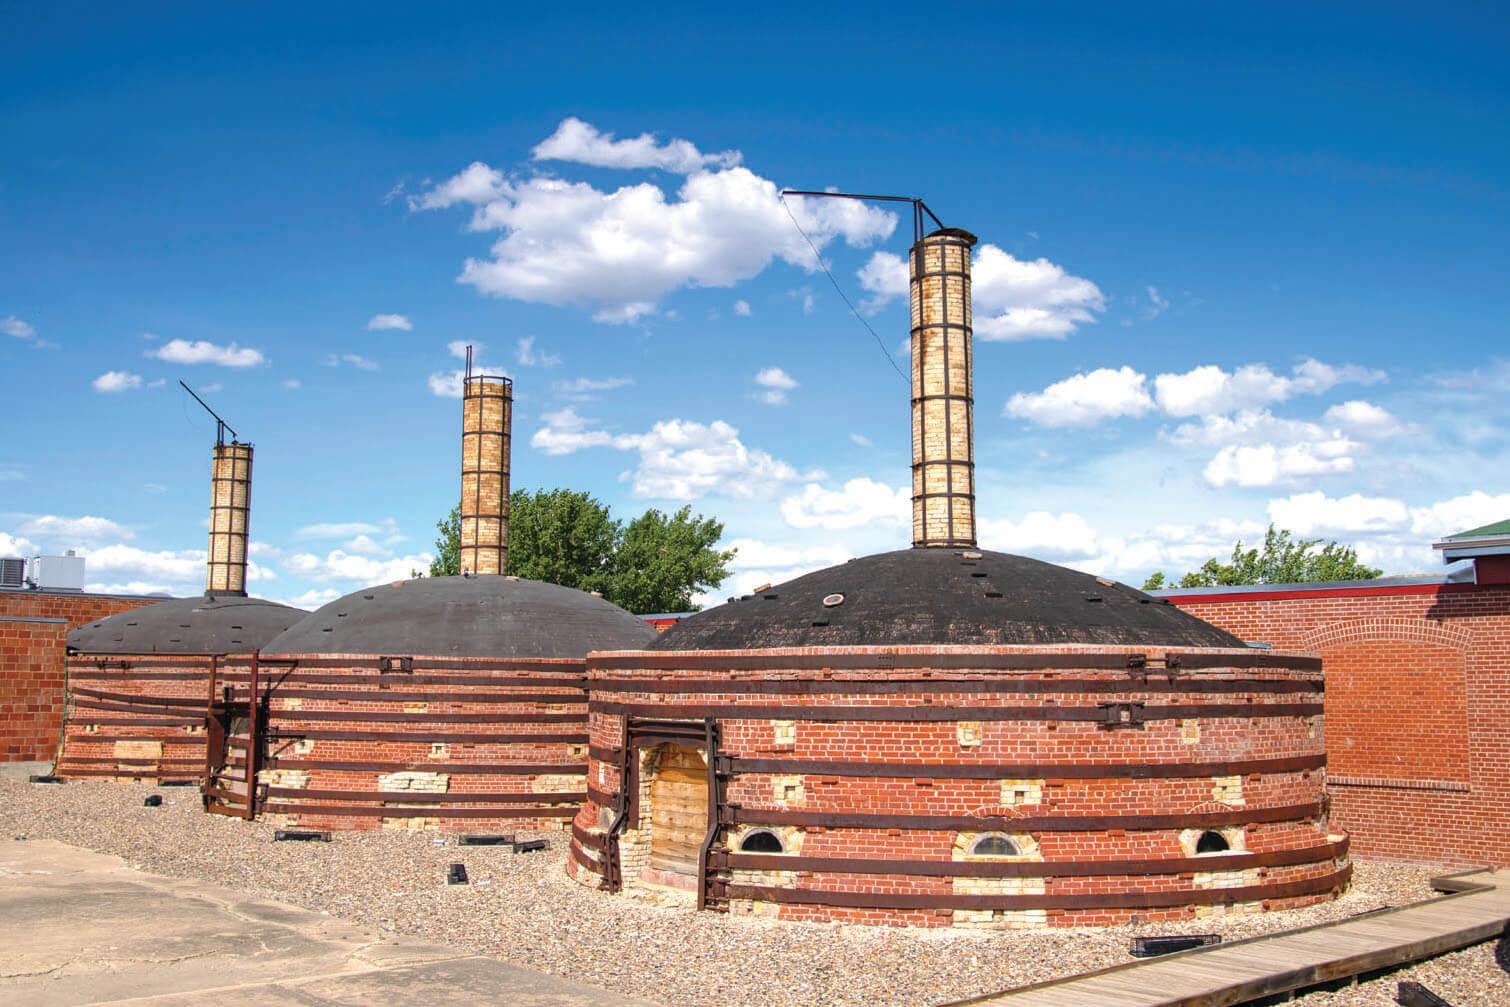 Medalta Historic Clay District